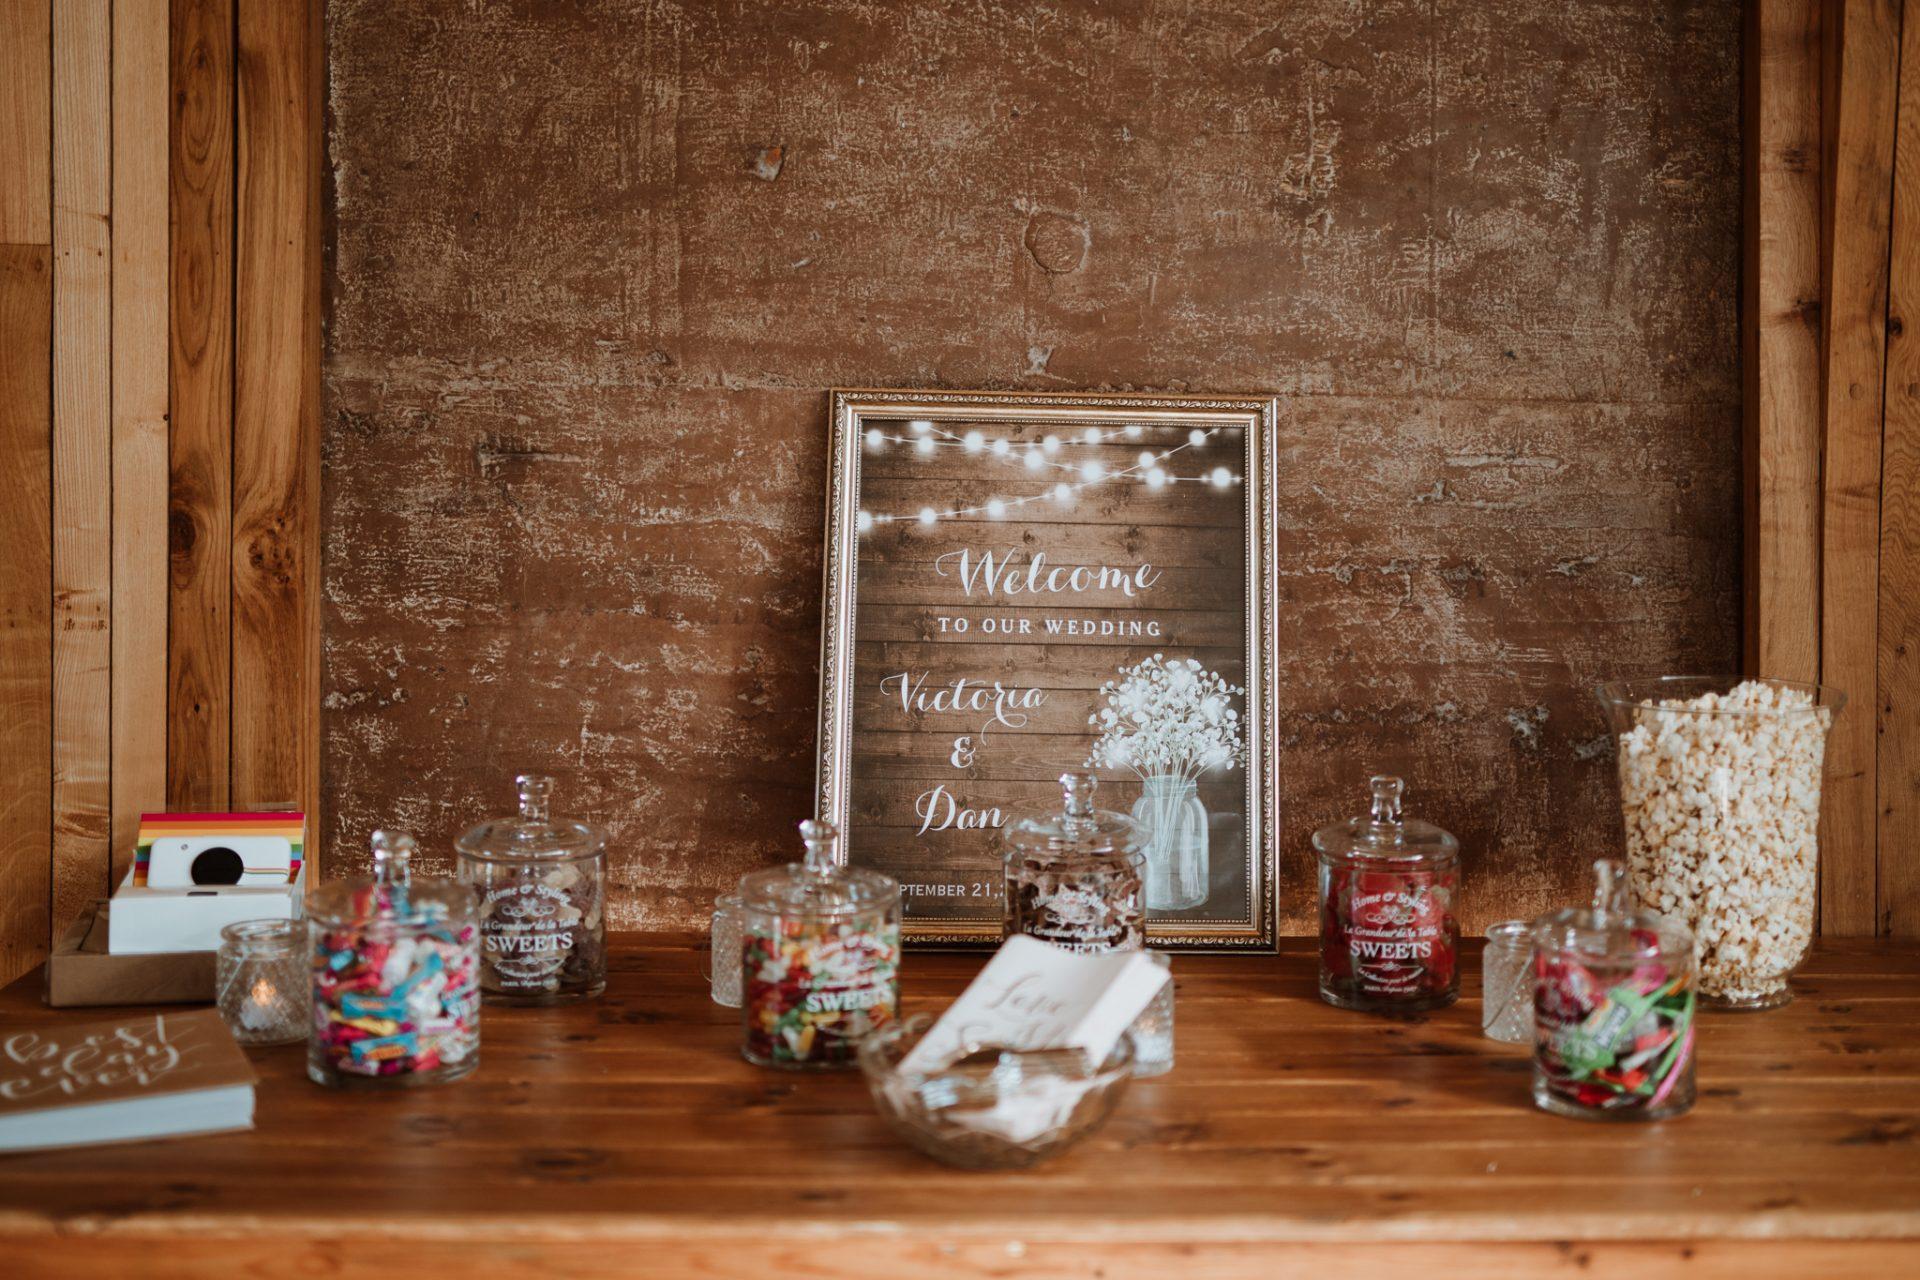 sweet table buffet